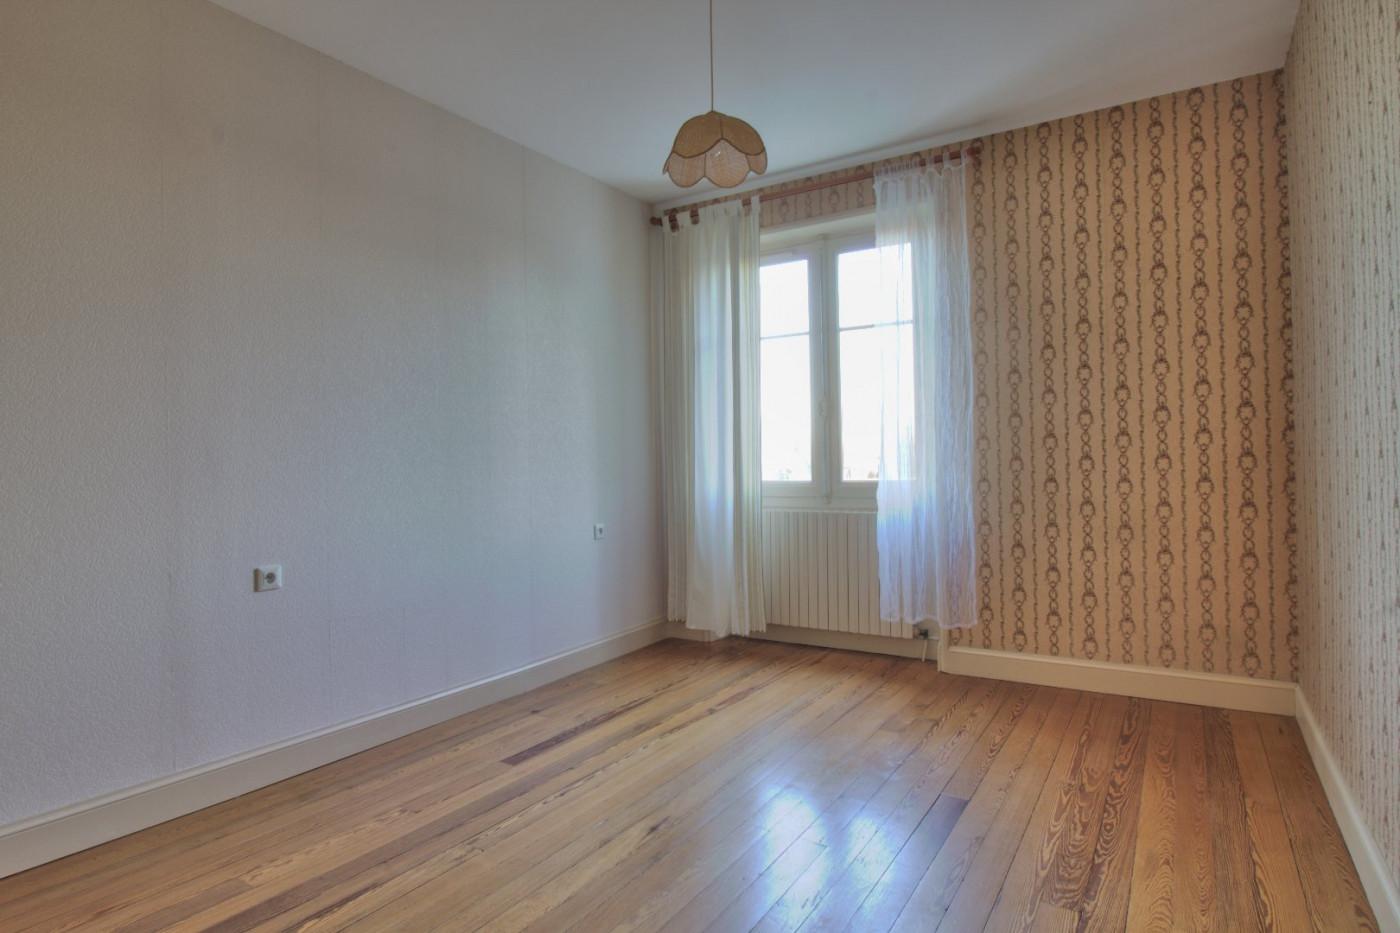 A vendre Erbray 44015509 Agence porte neuve immobilier